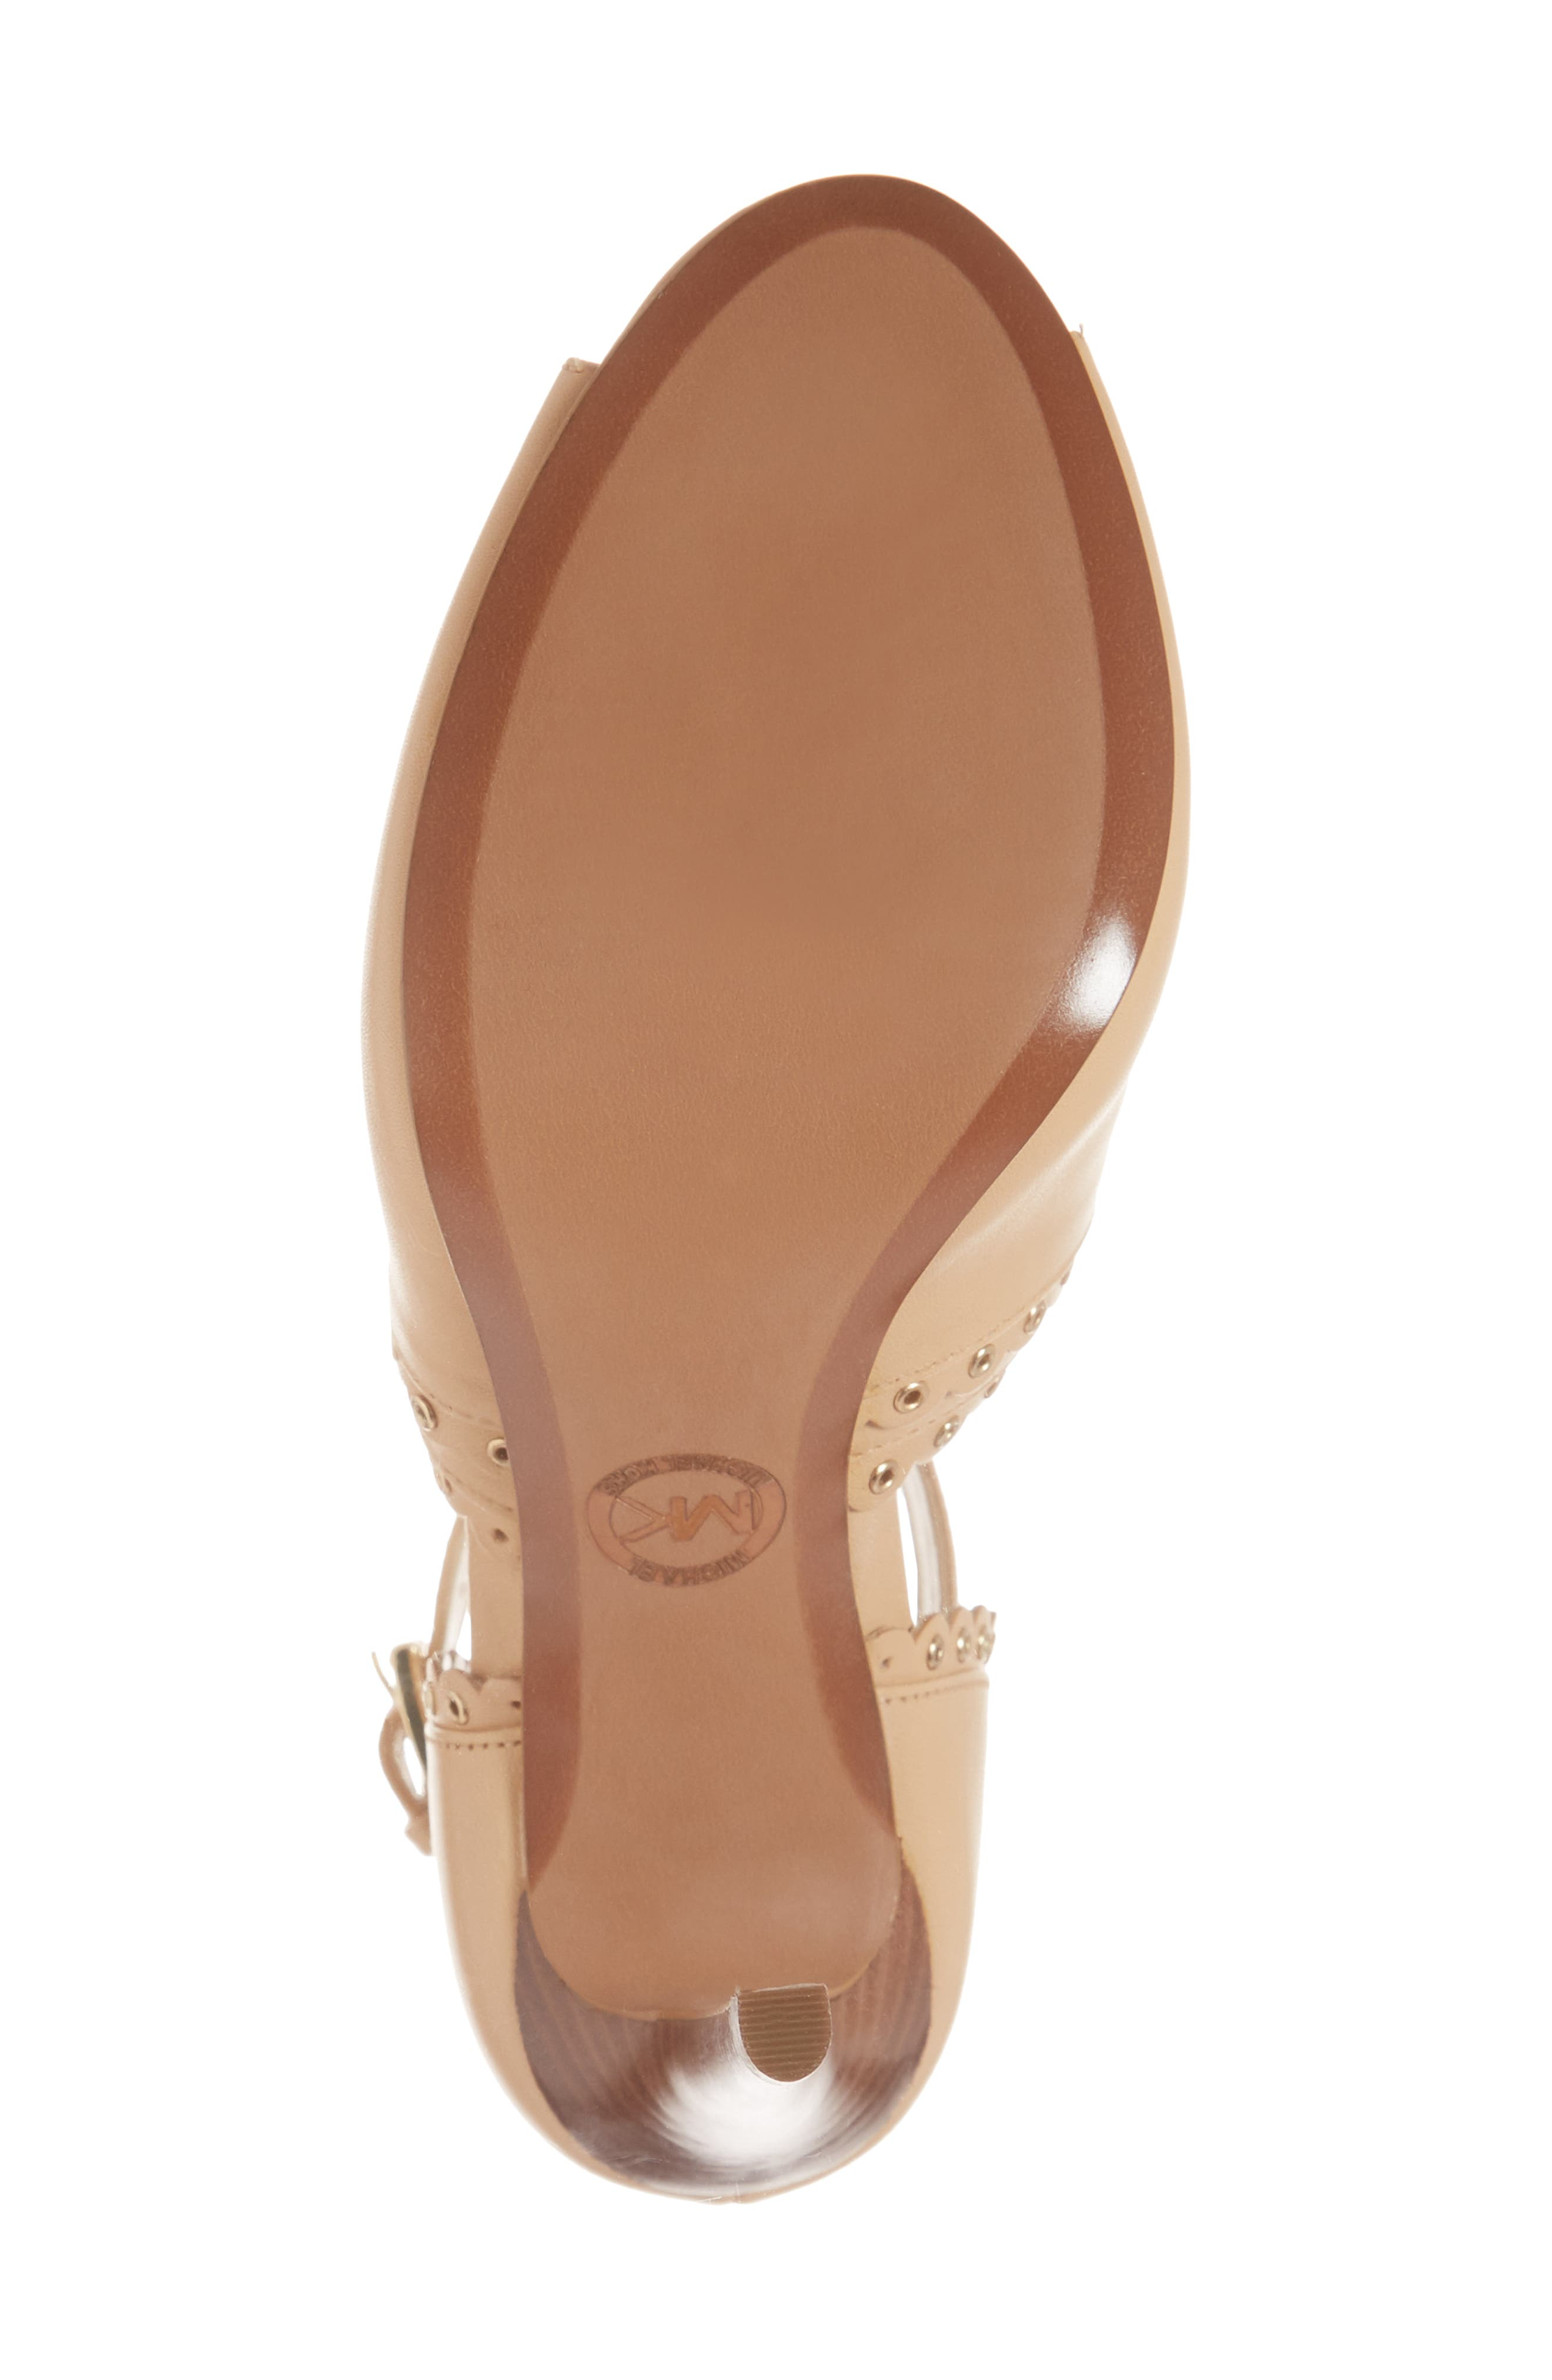 Jessie Ankle Strap Sandal,                             Alternate thumbnail 6, color,                             BUTTERNUT LEATHER